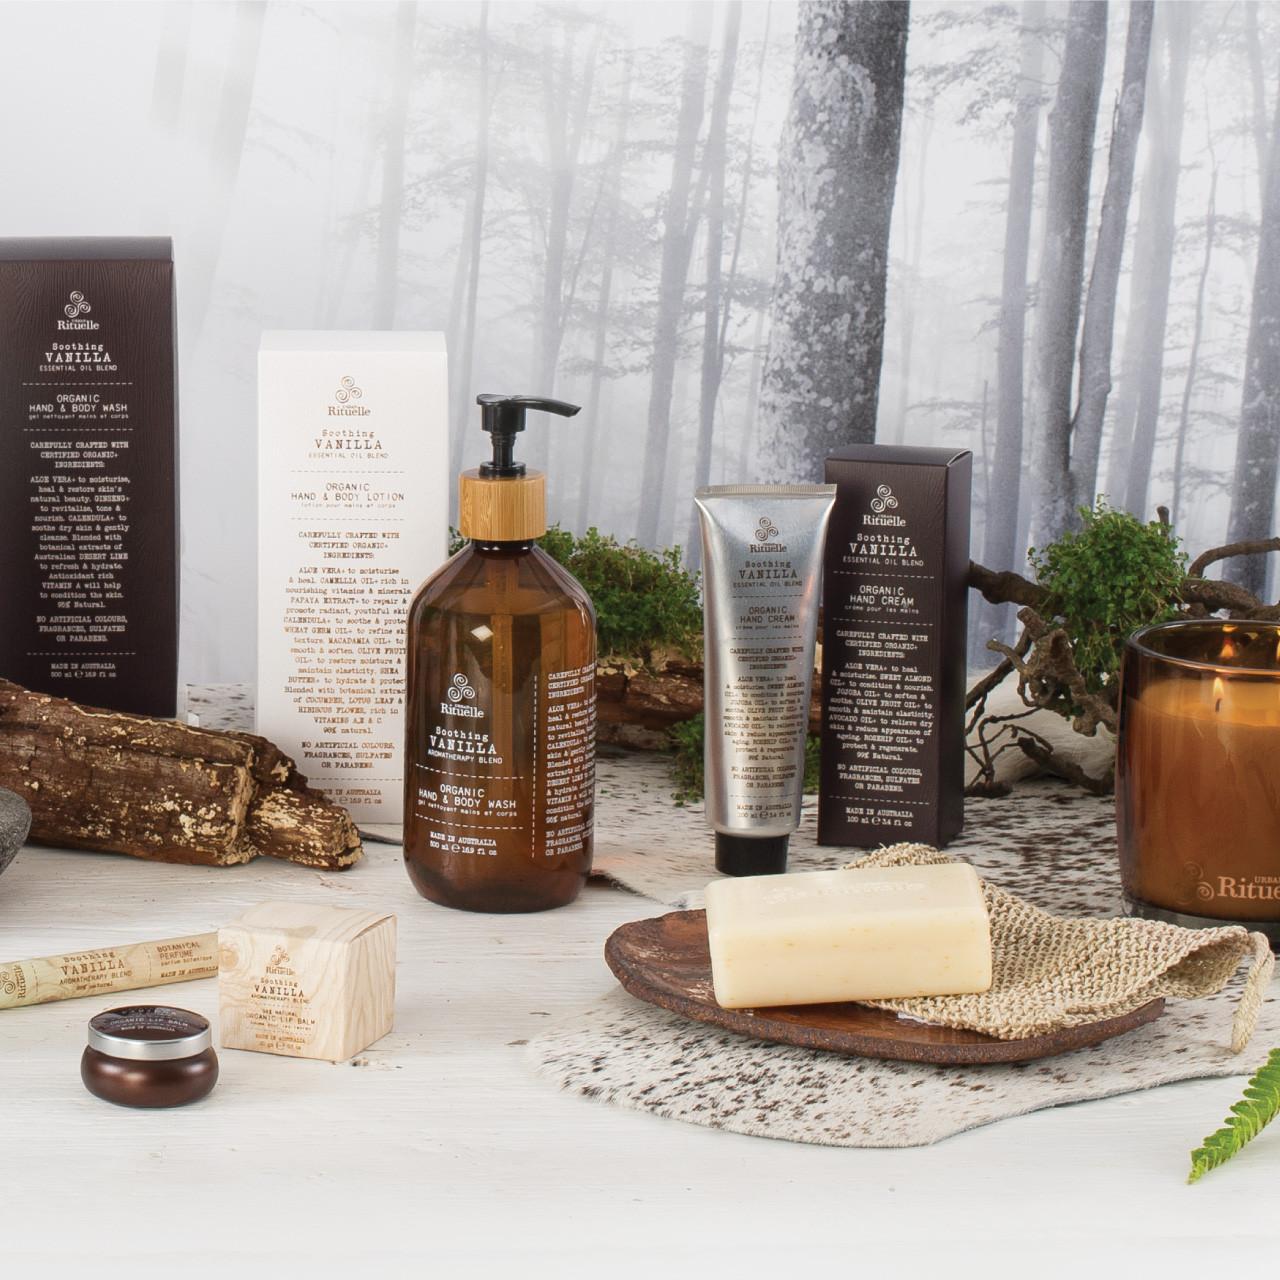 Flourish Organics - Organic Hand Cream - Vanilla - Urban Rituelle